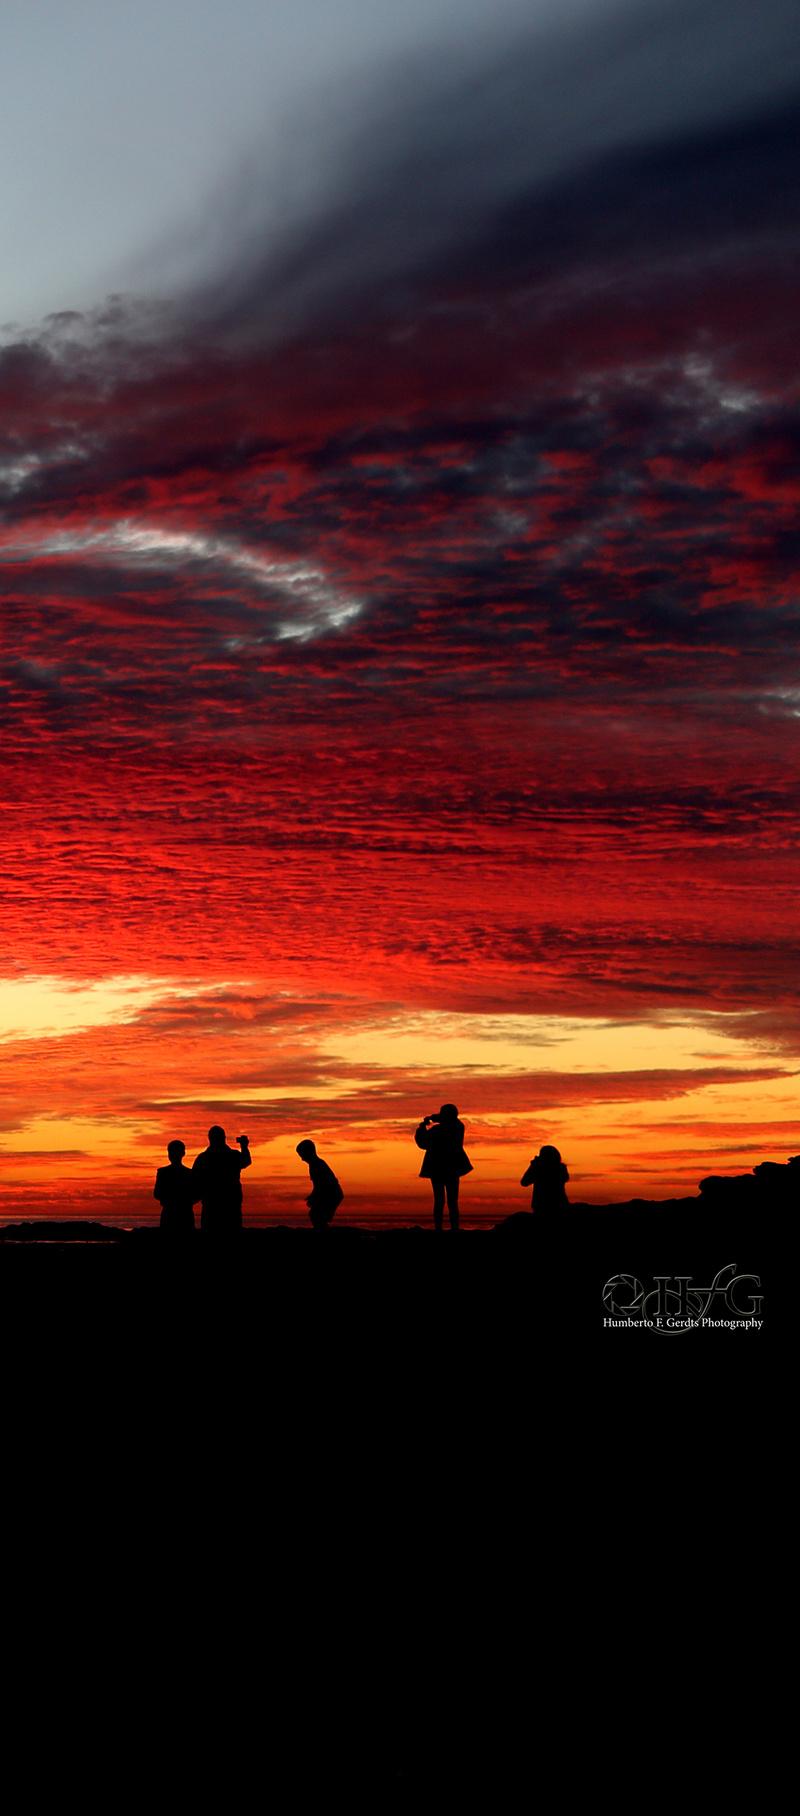 San Pedro, CA Feb 02, 2014 2014 HFG Photography A Beautiful Sunset on 01/19/2014 at San Pedro, CA.